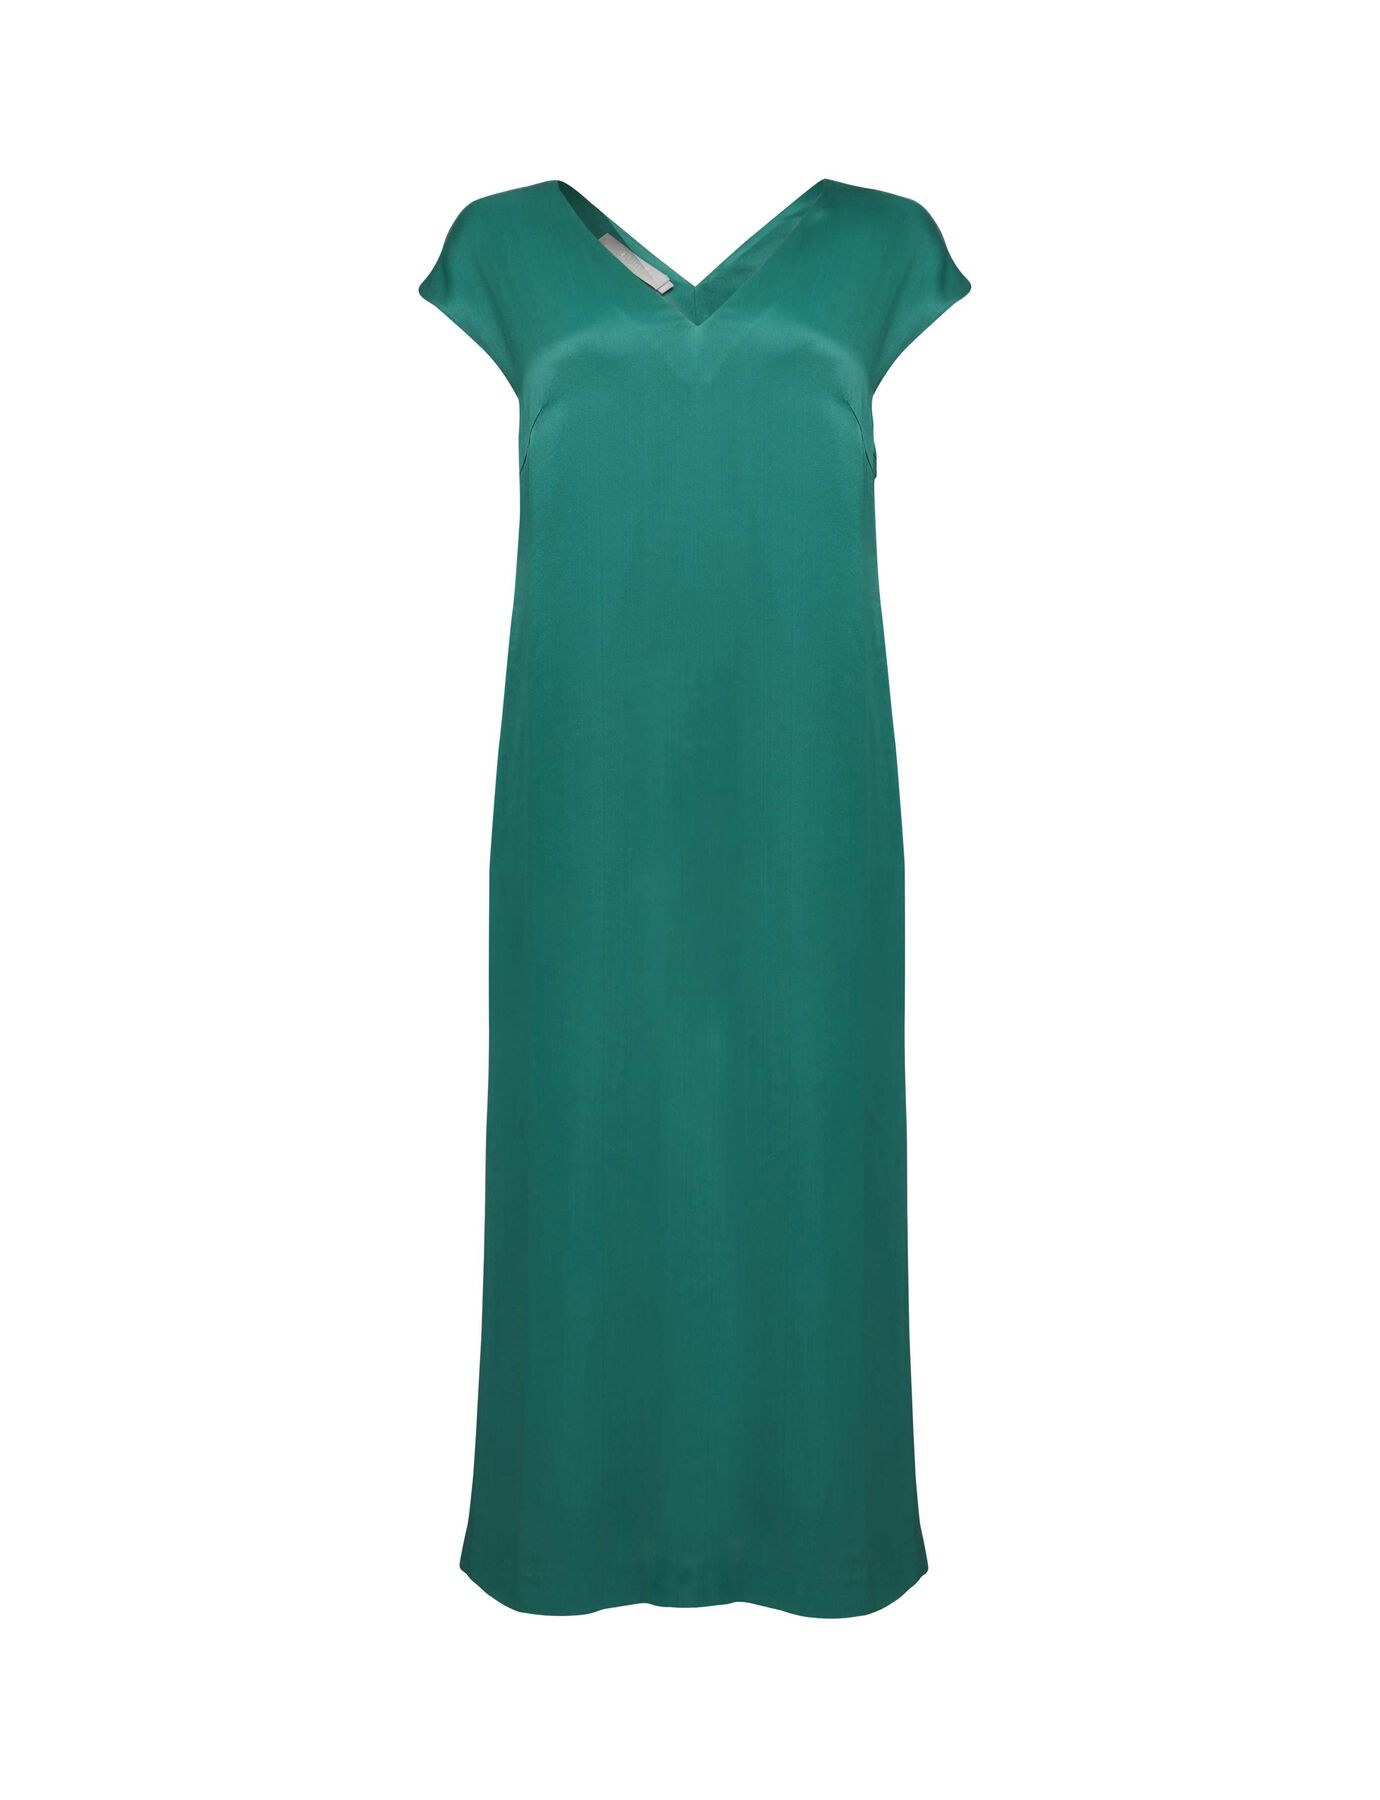 Ibbie dress